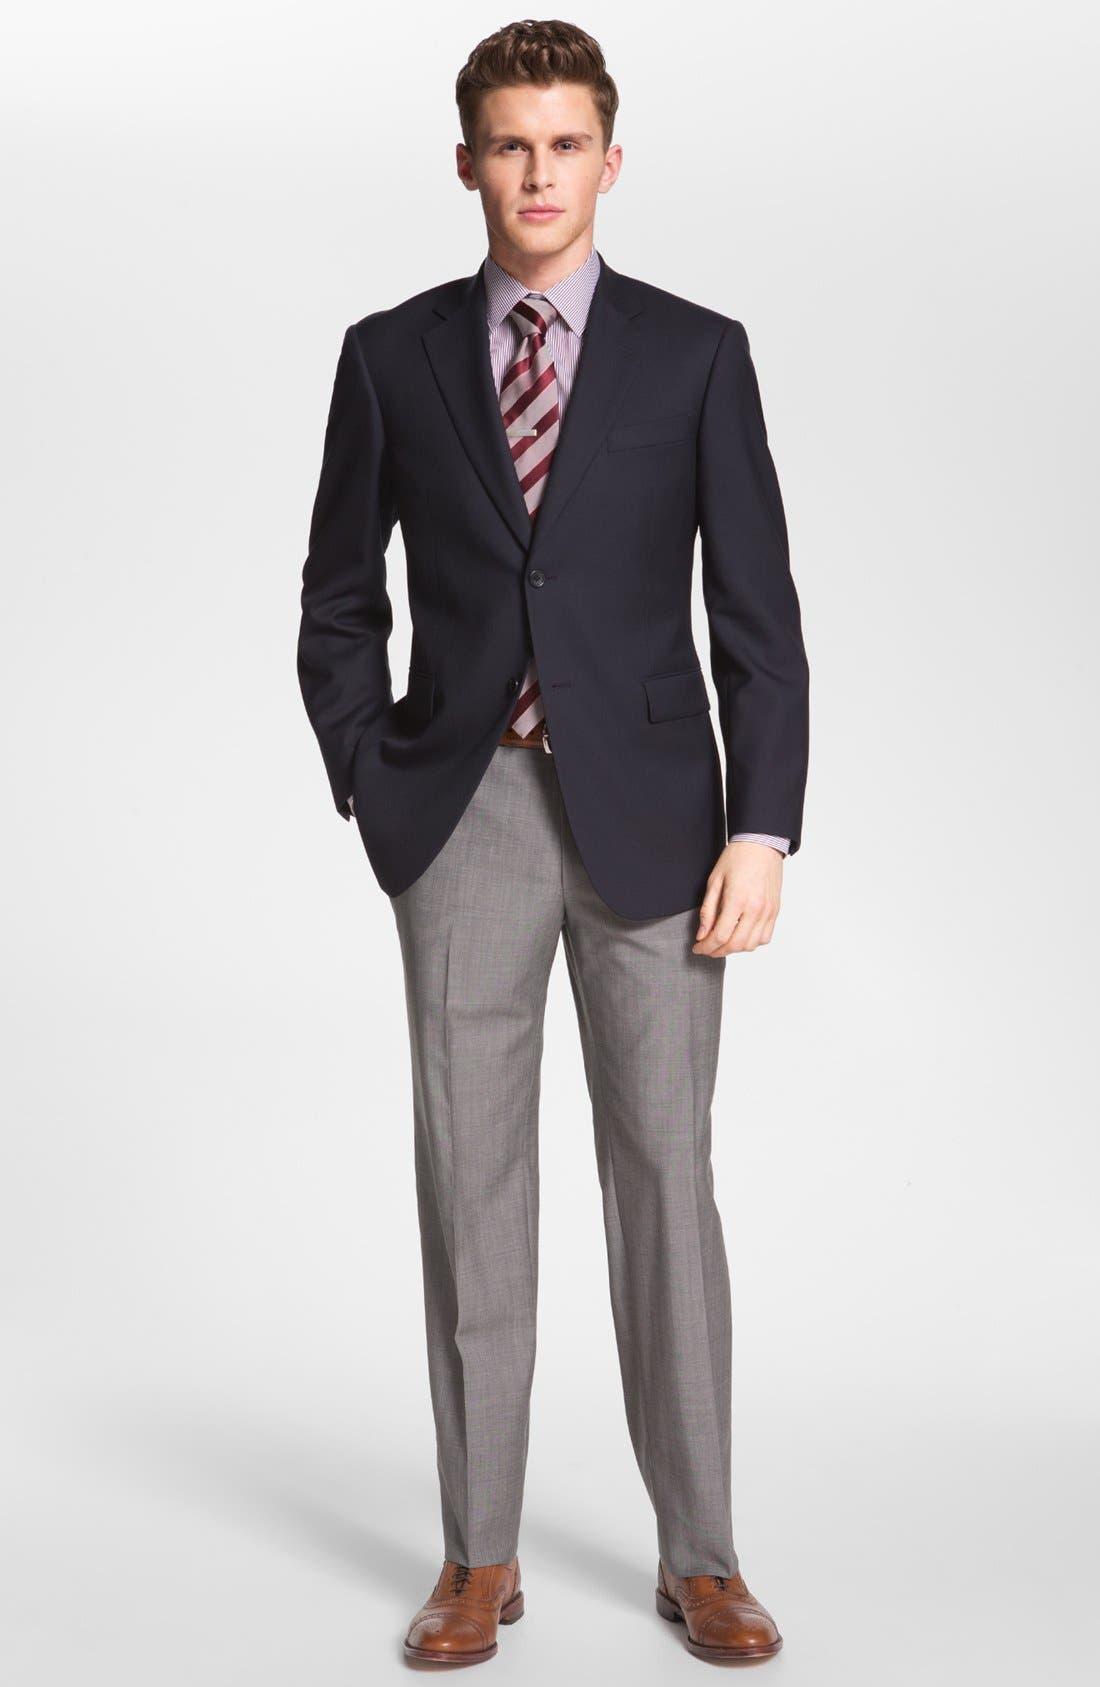 BOSS HUGO BOSS 'Jeffrey US' Flat Front Pinpoint Wool Trousers,                             Alternate thumbnail 5, color,                             022